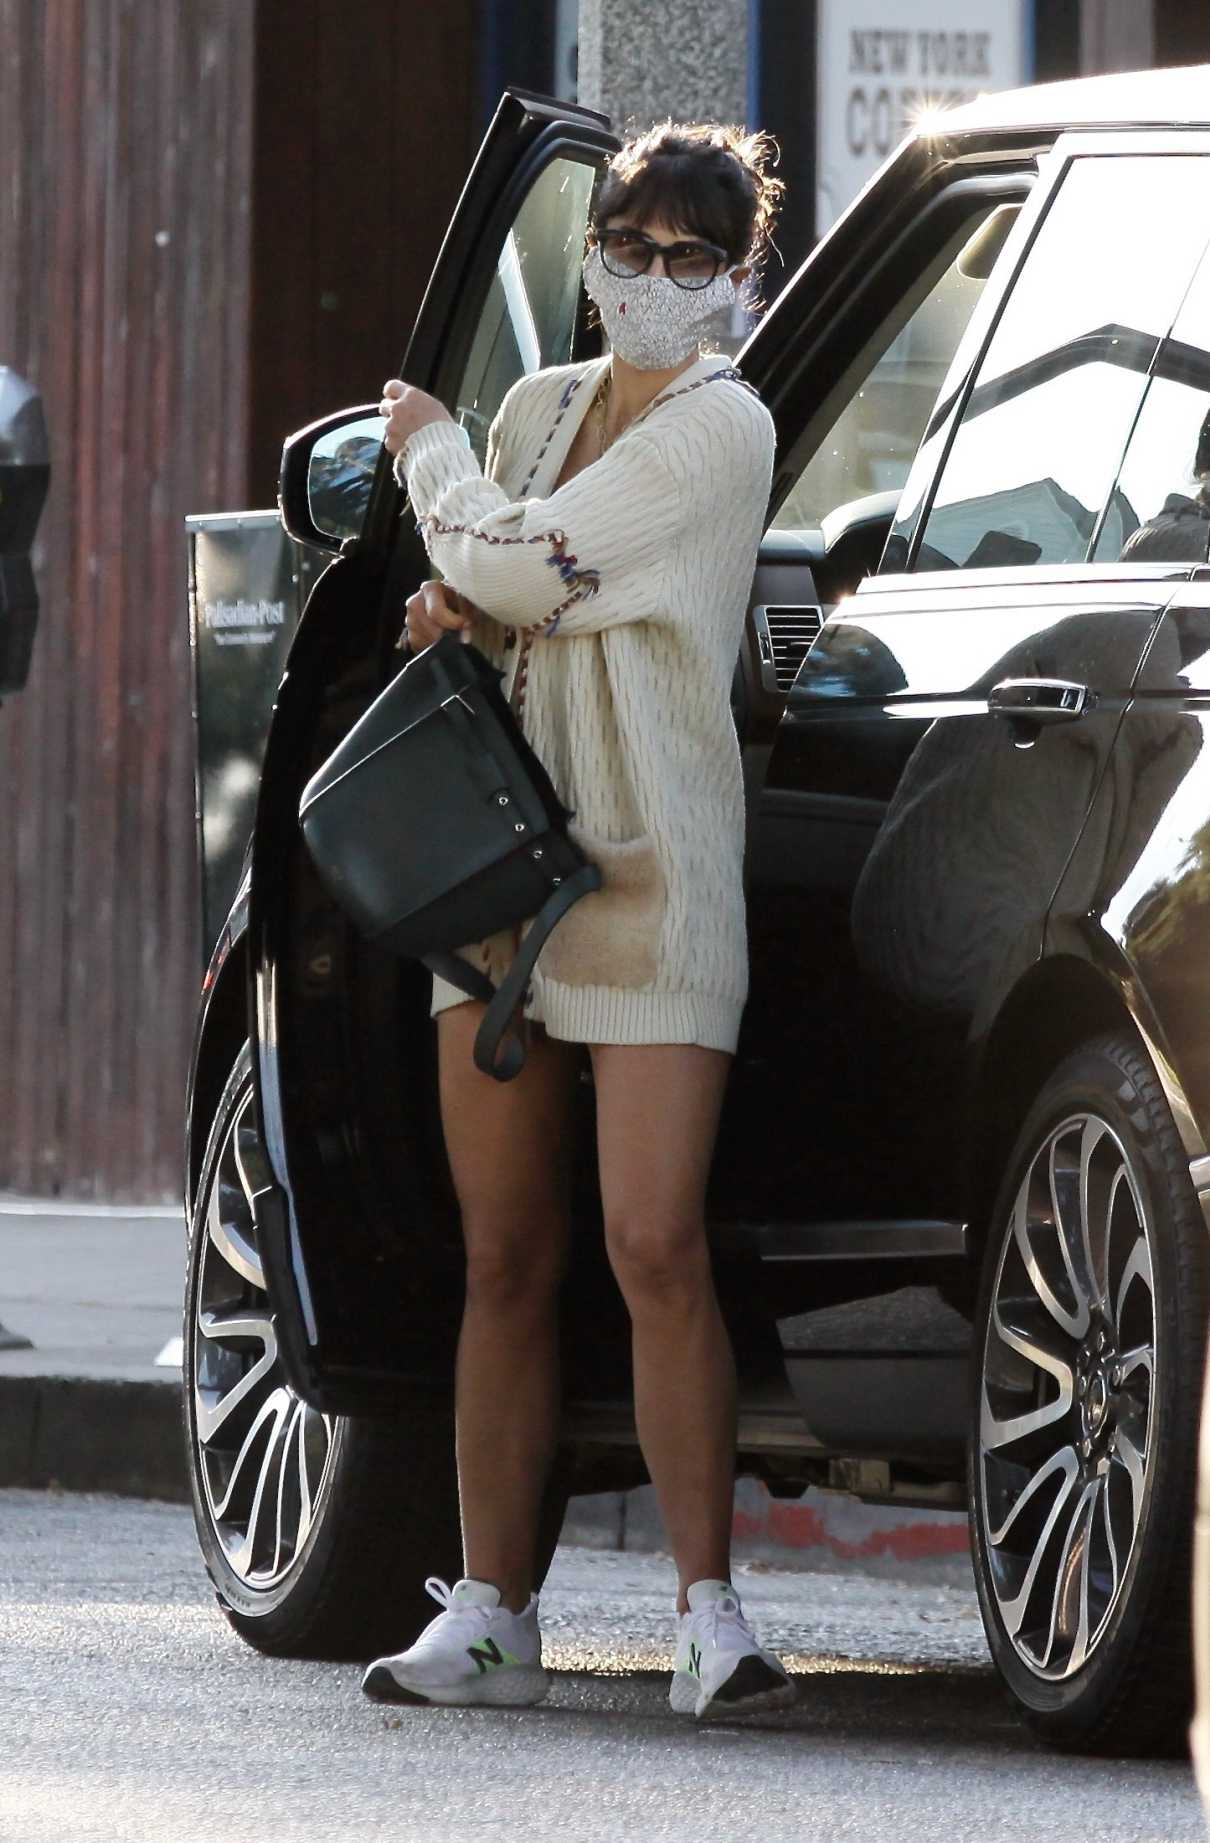 Jordana Brewster in a White Cardigan